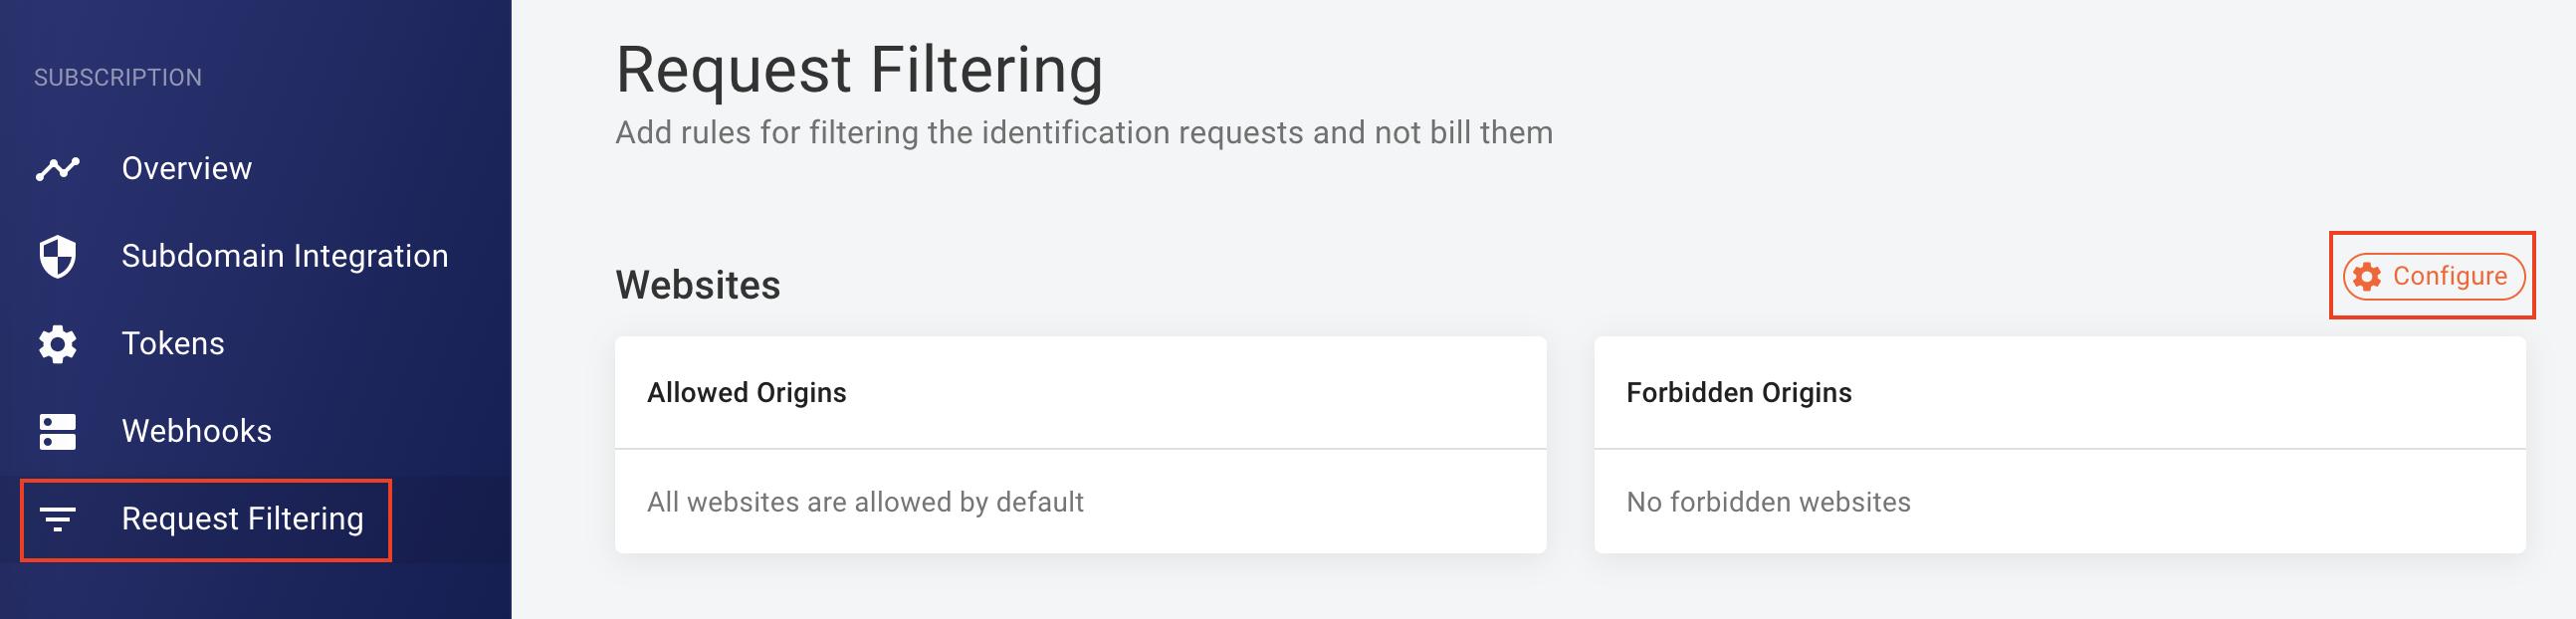 Screenshot of how to configure request filtering in the FingerprintJS dashboard